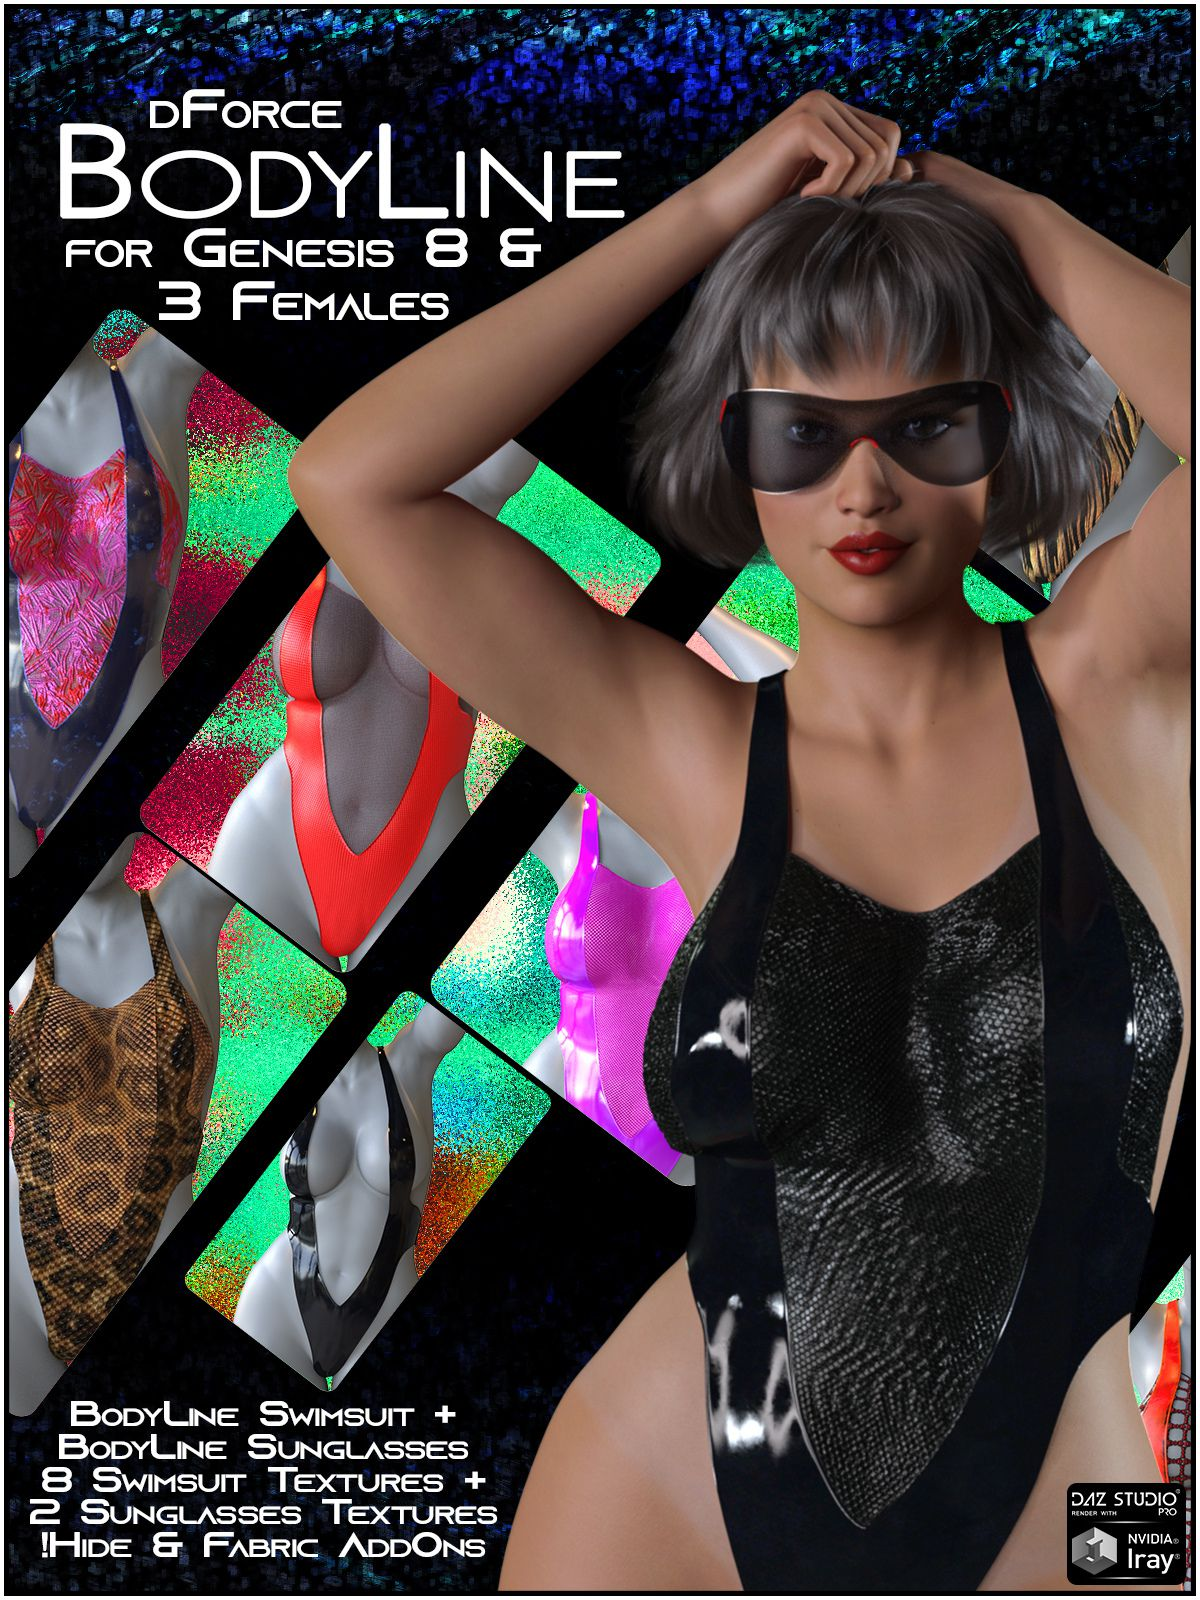 dForce BodyLine for Genesis 8 and 3 Females_DAZ3D下载站